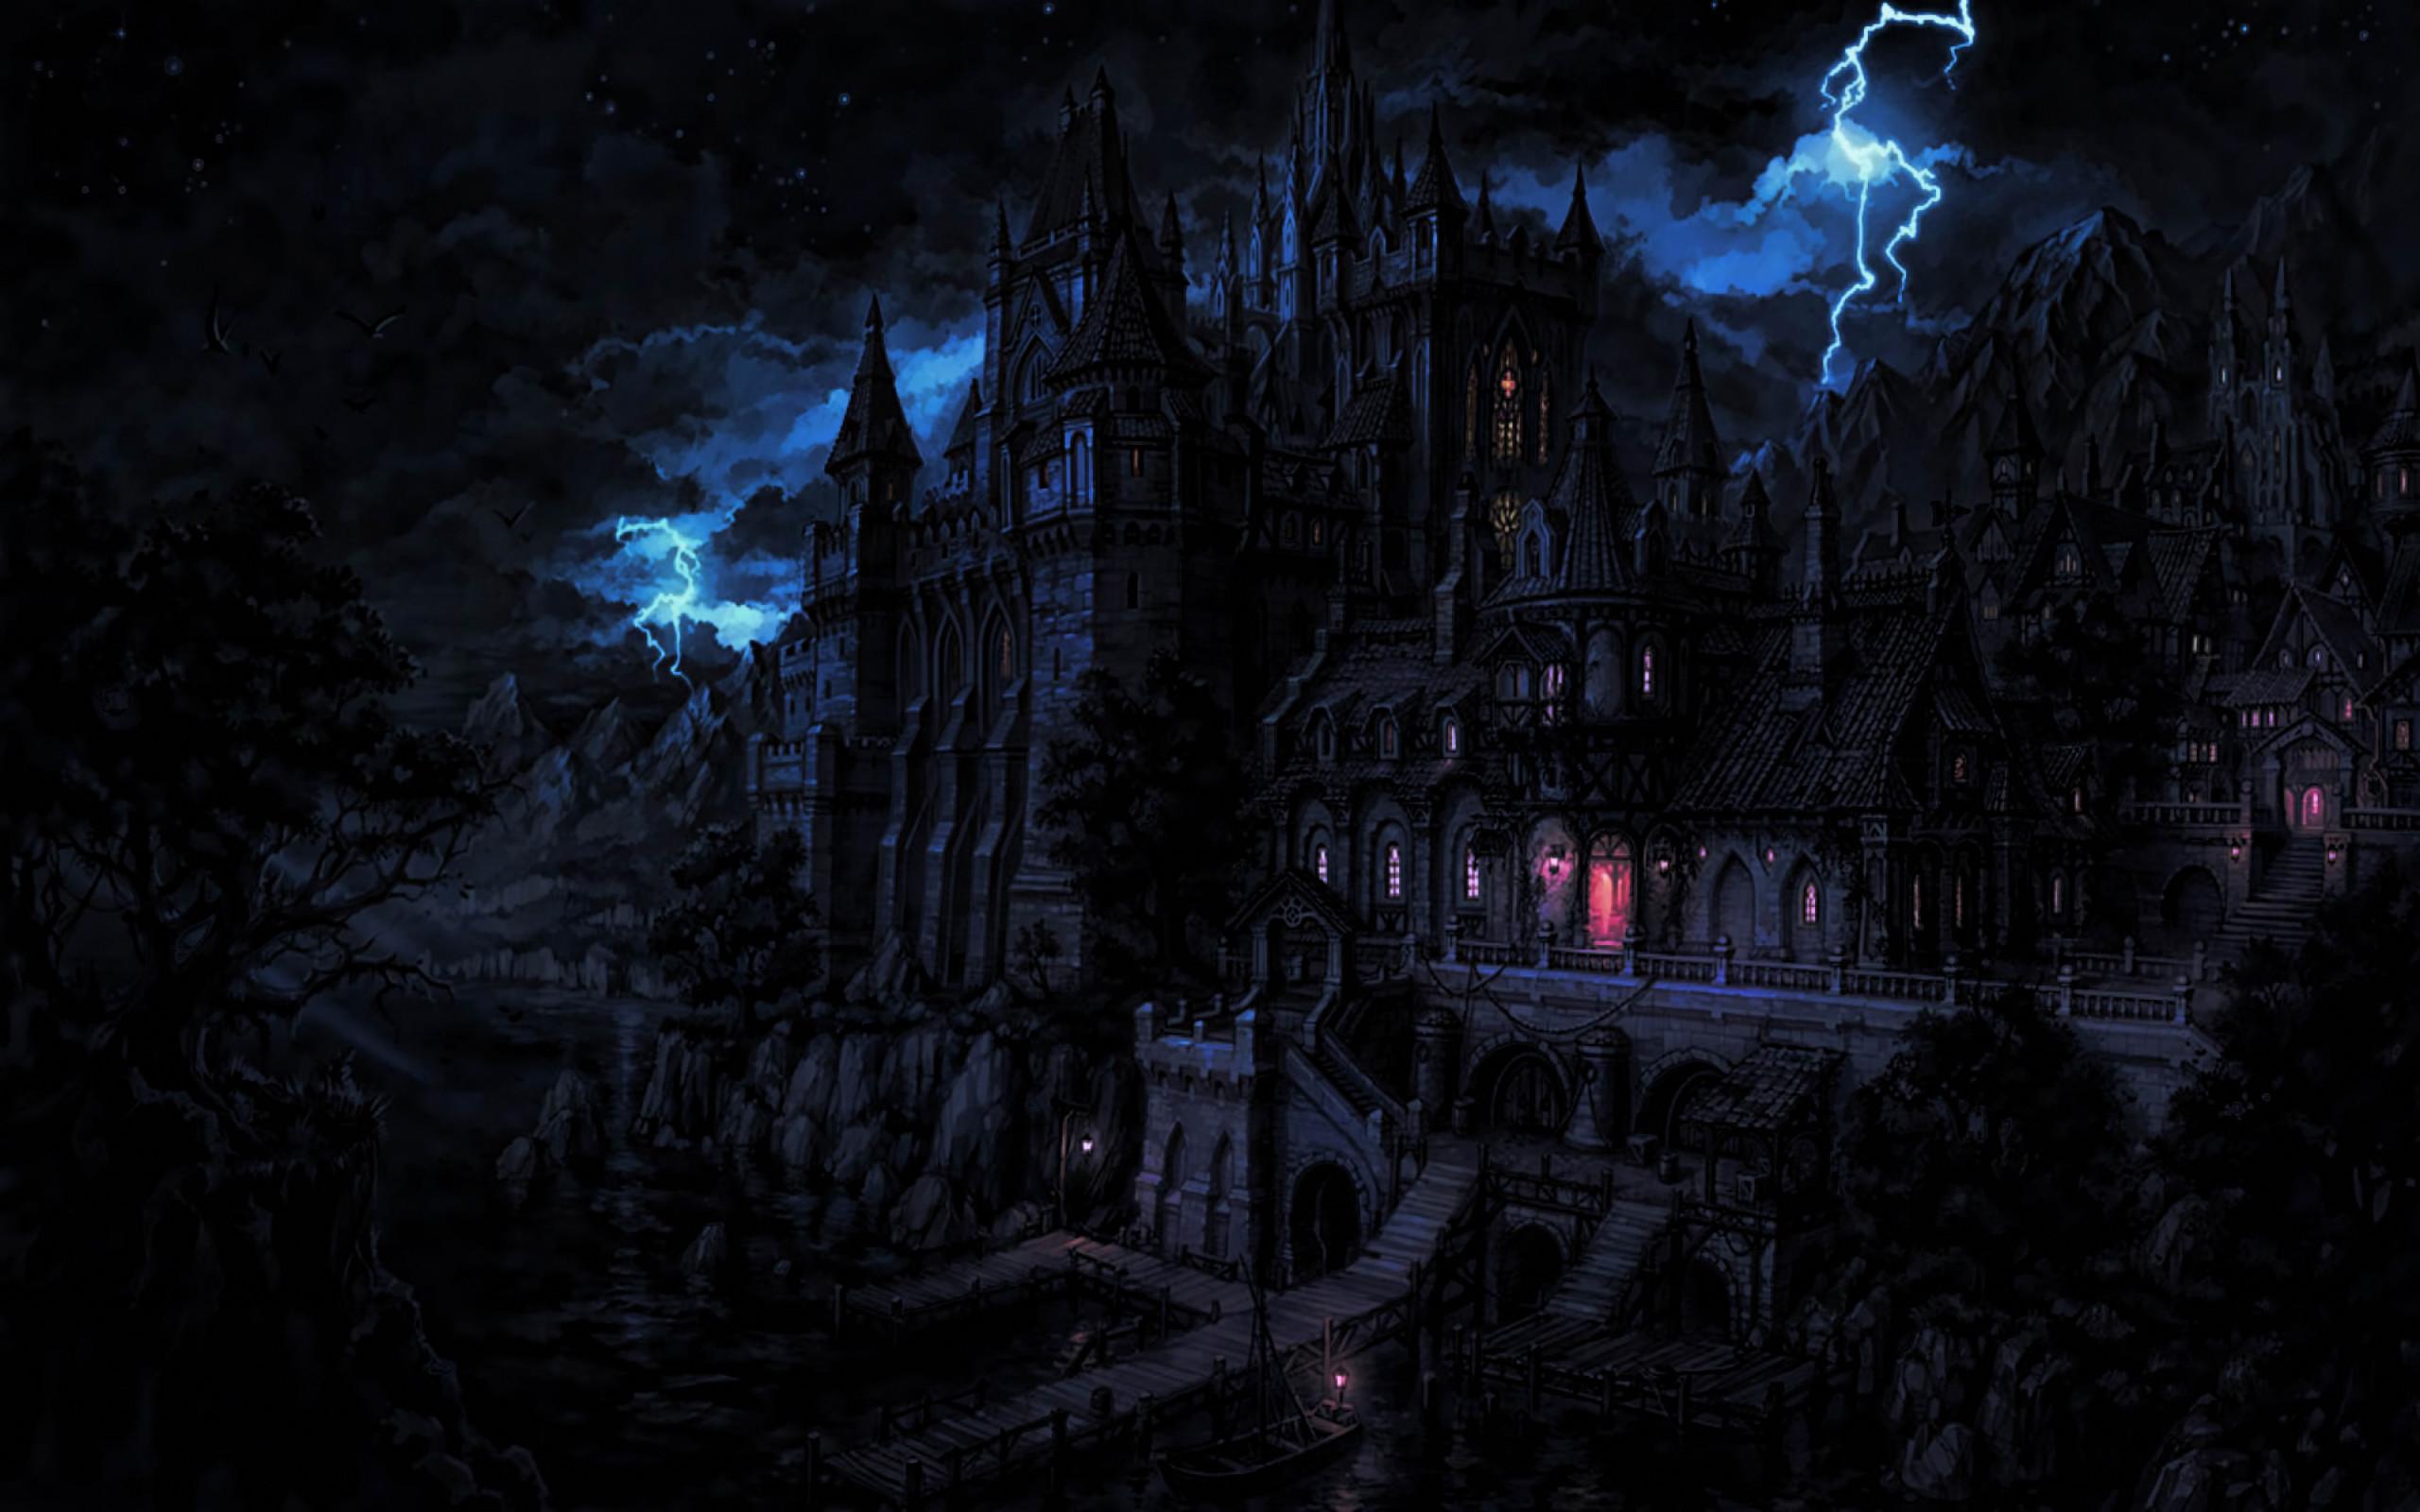 Vampire-Castle-High-Definition-xk-x-px-MB-